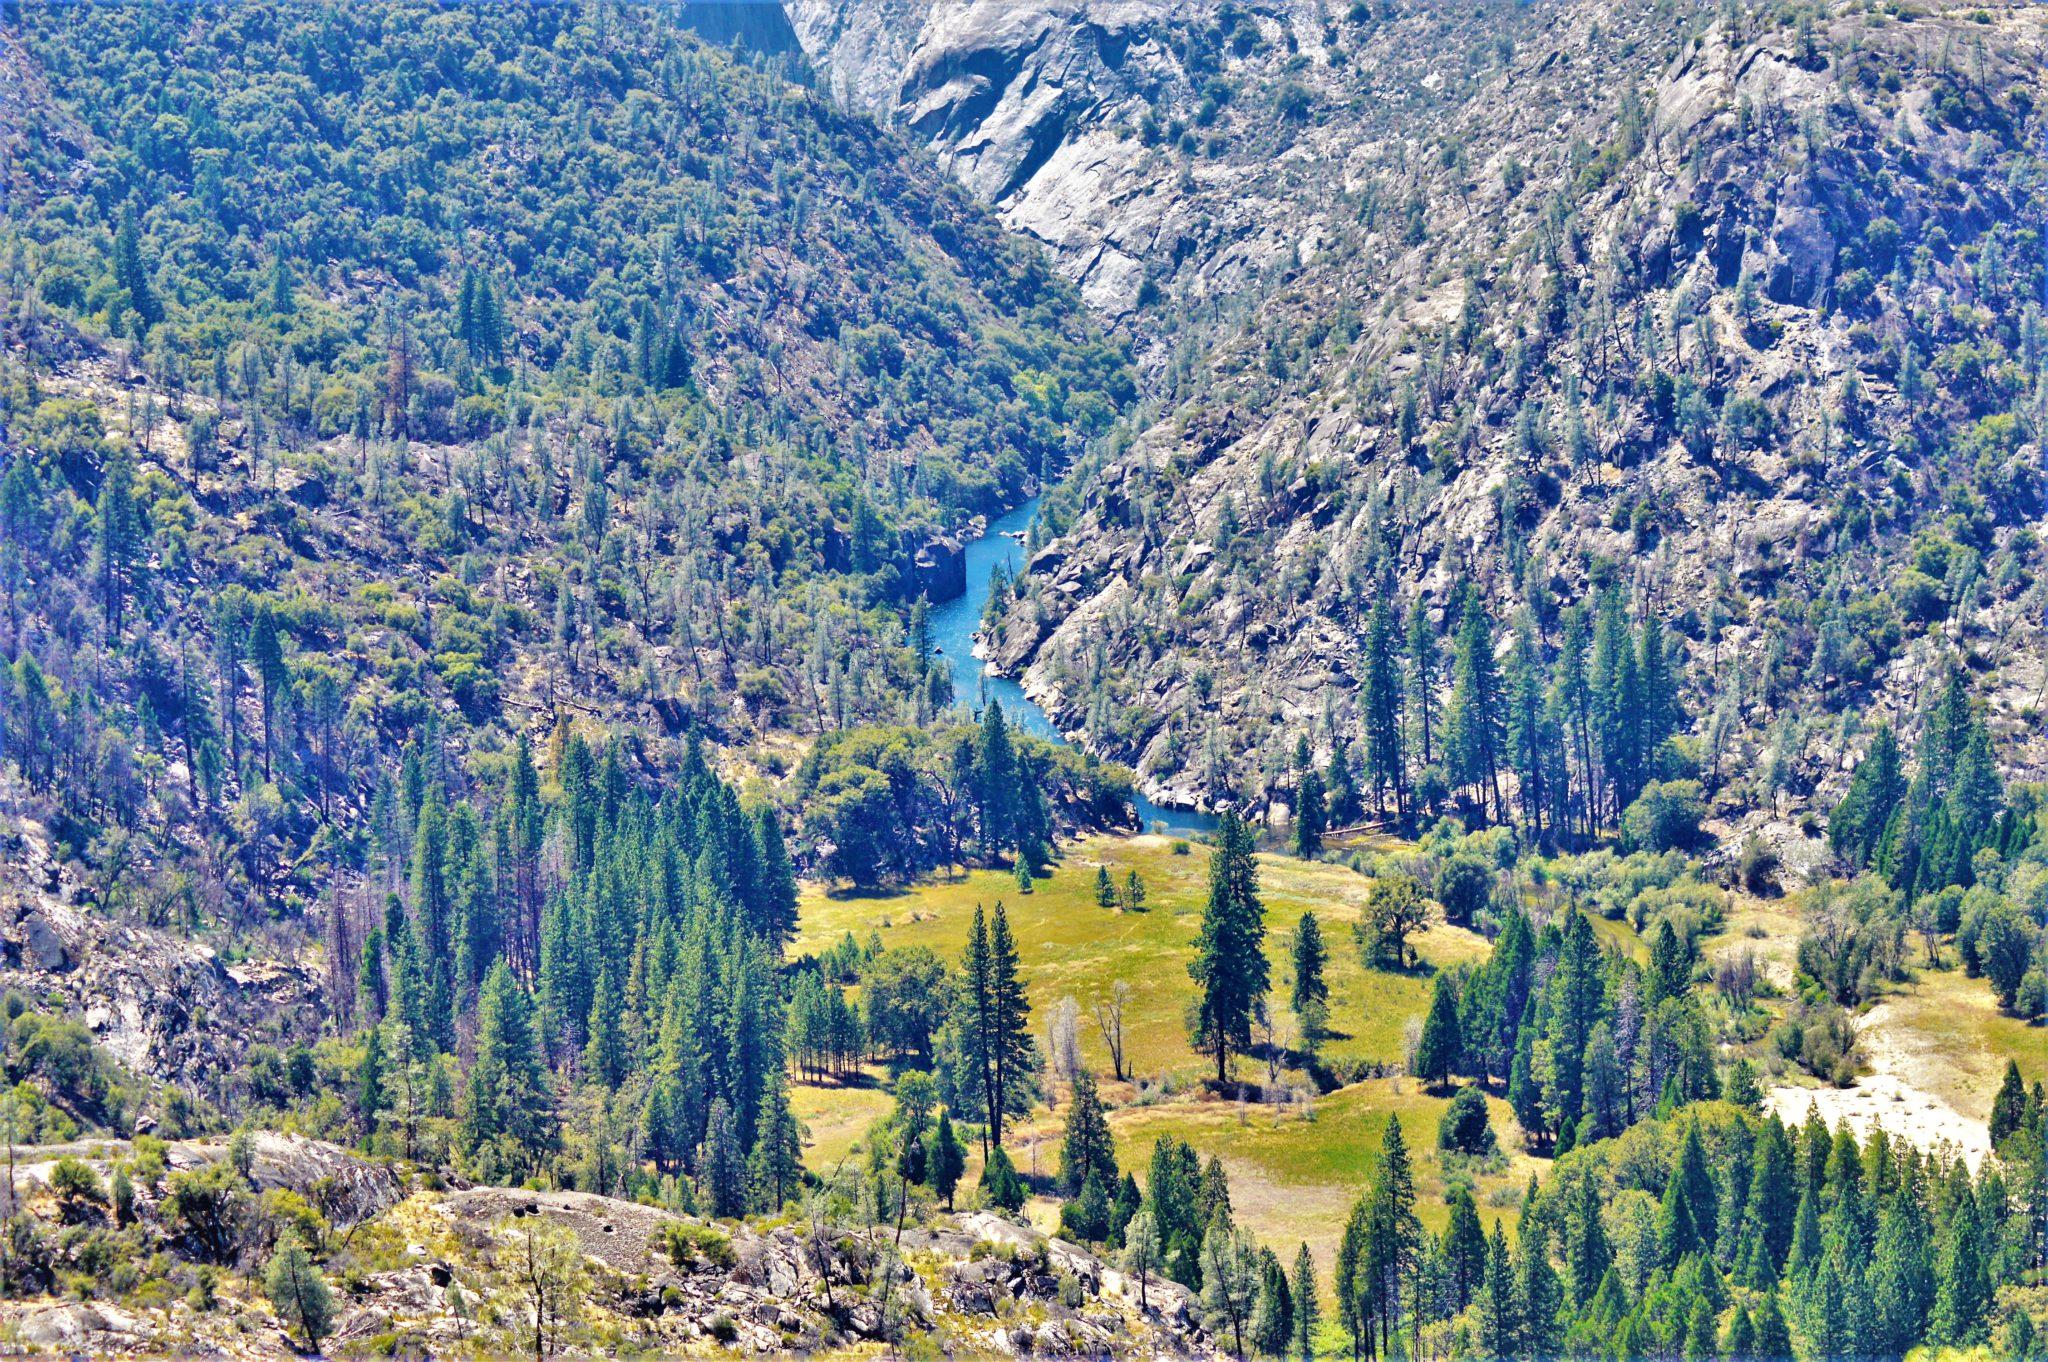 Scenery at Hetch Hetchy, California dam, things to do at yosemite